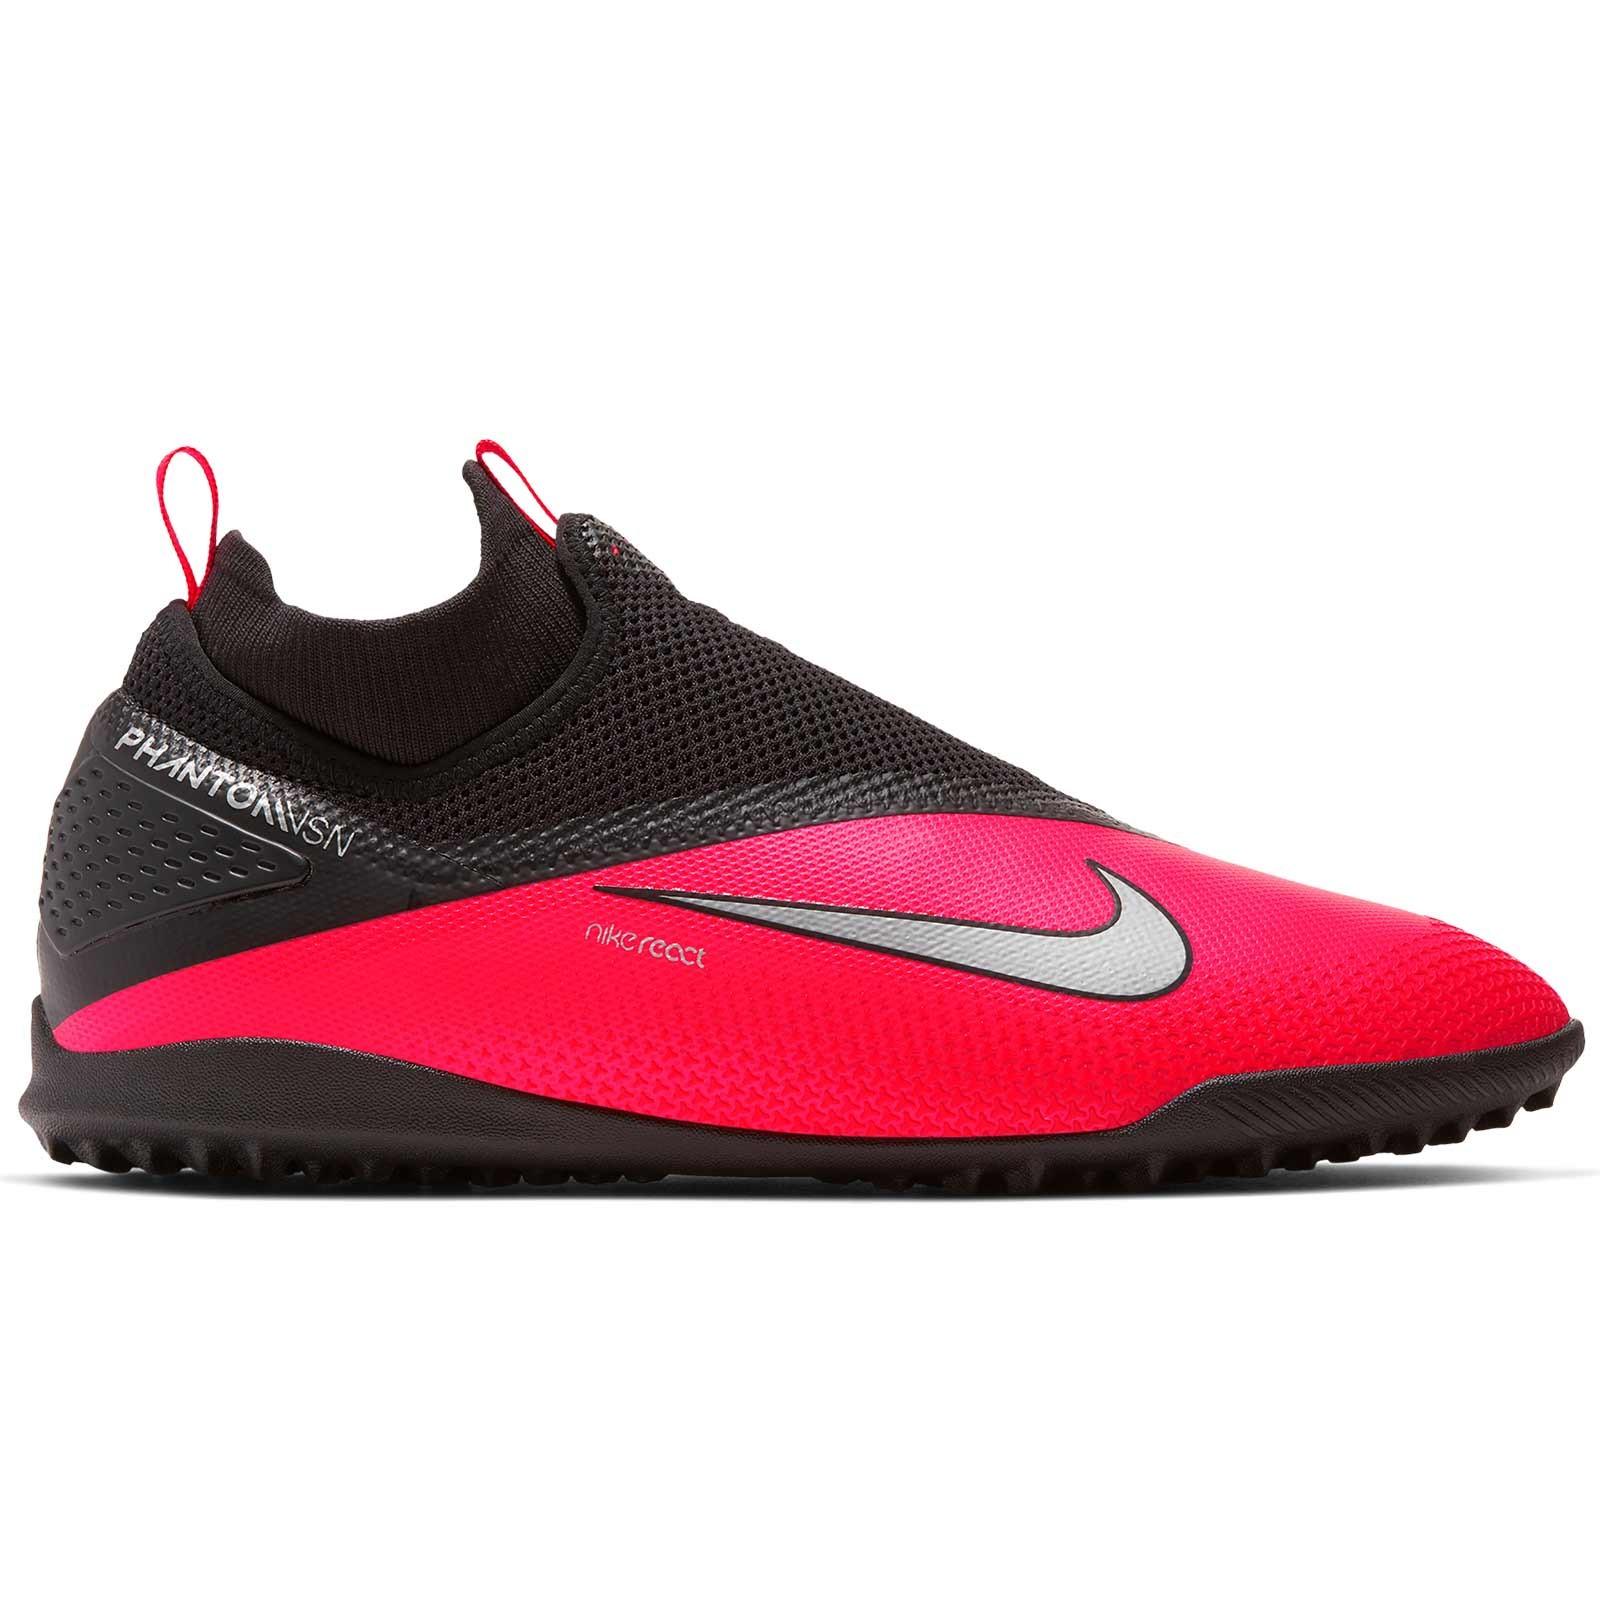 Buty piłkarskie turfy Phantom Vision Academy Dynamic Fit TF Nike (czarno żółte)